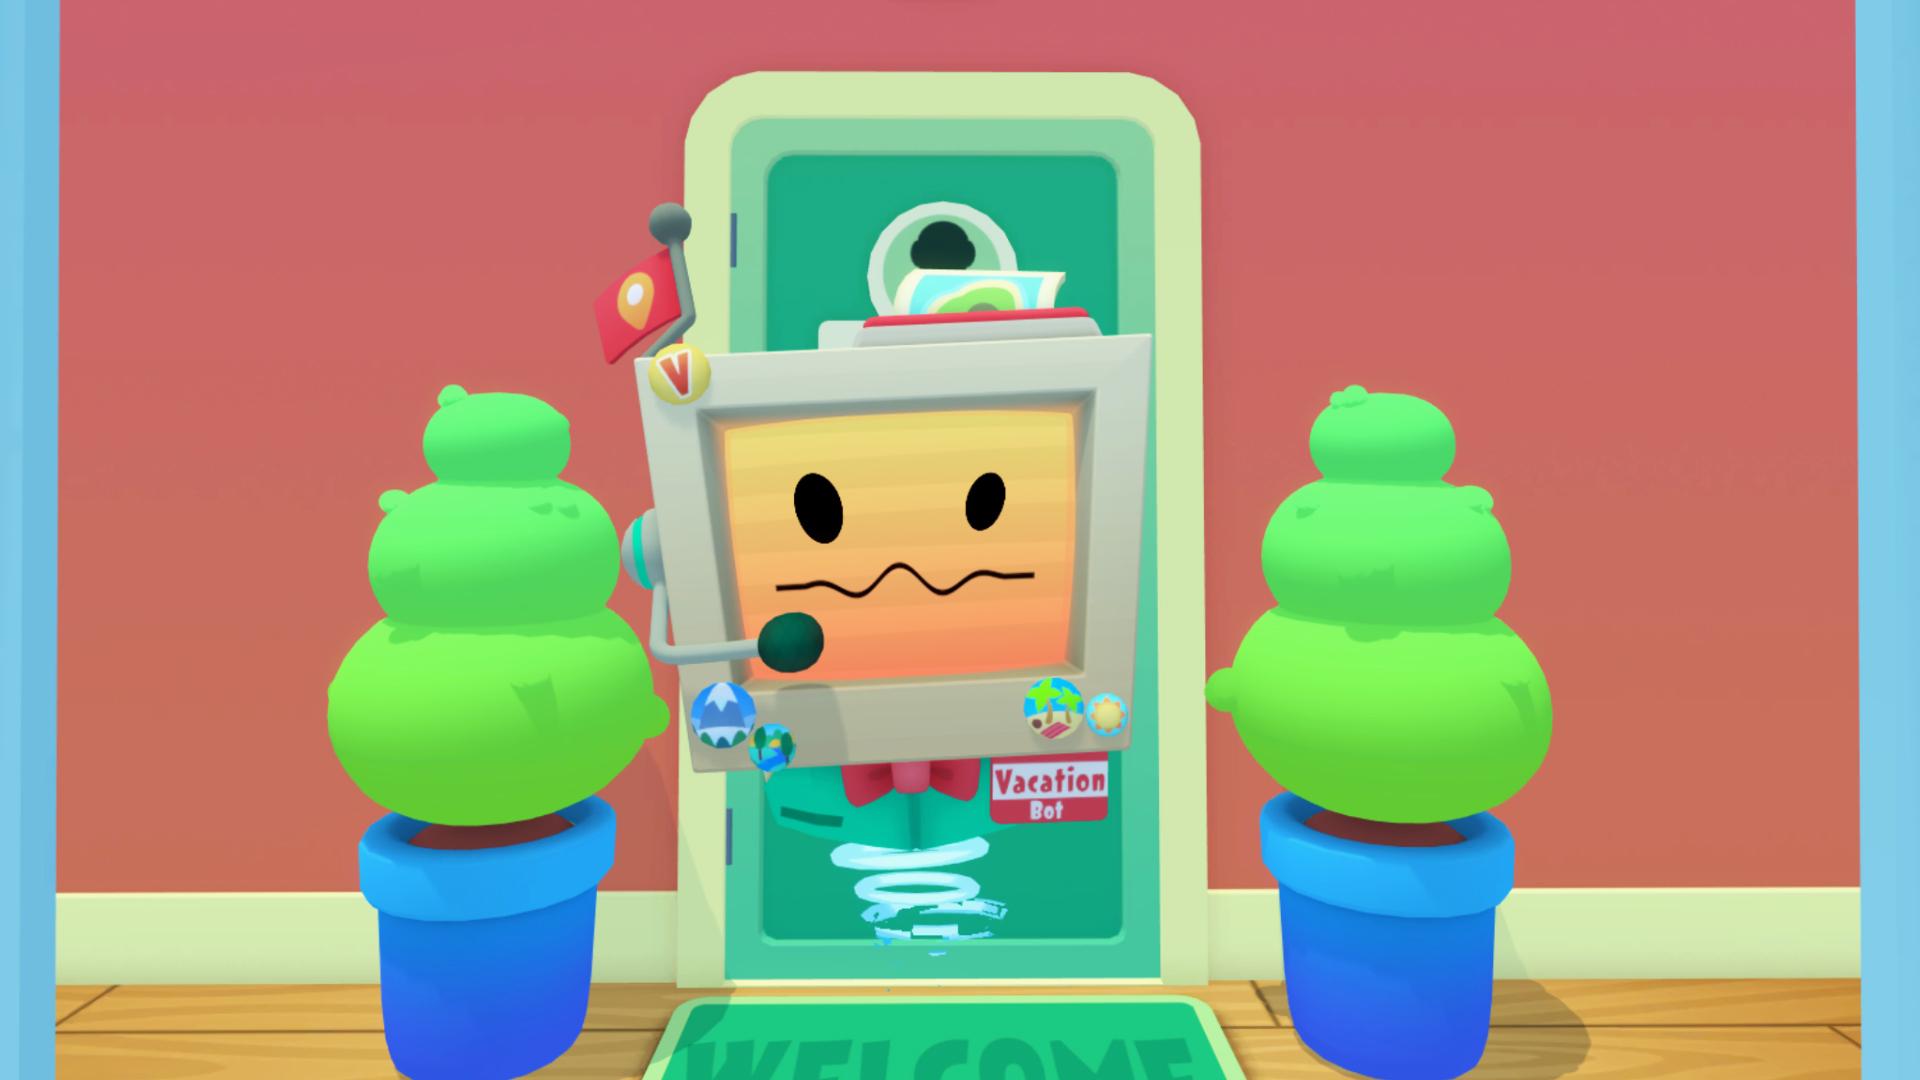 vacation simulator game wallpaper 67984